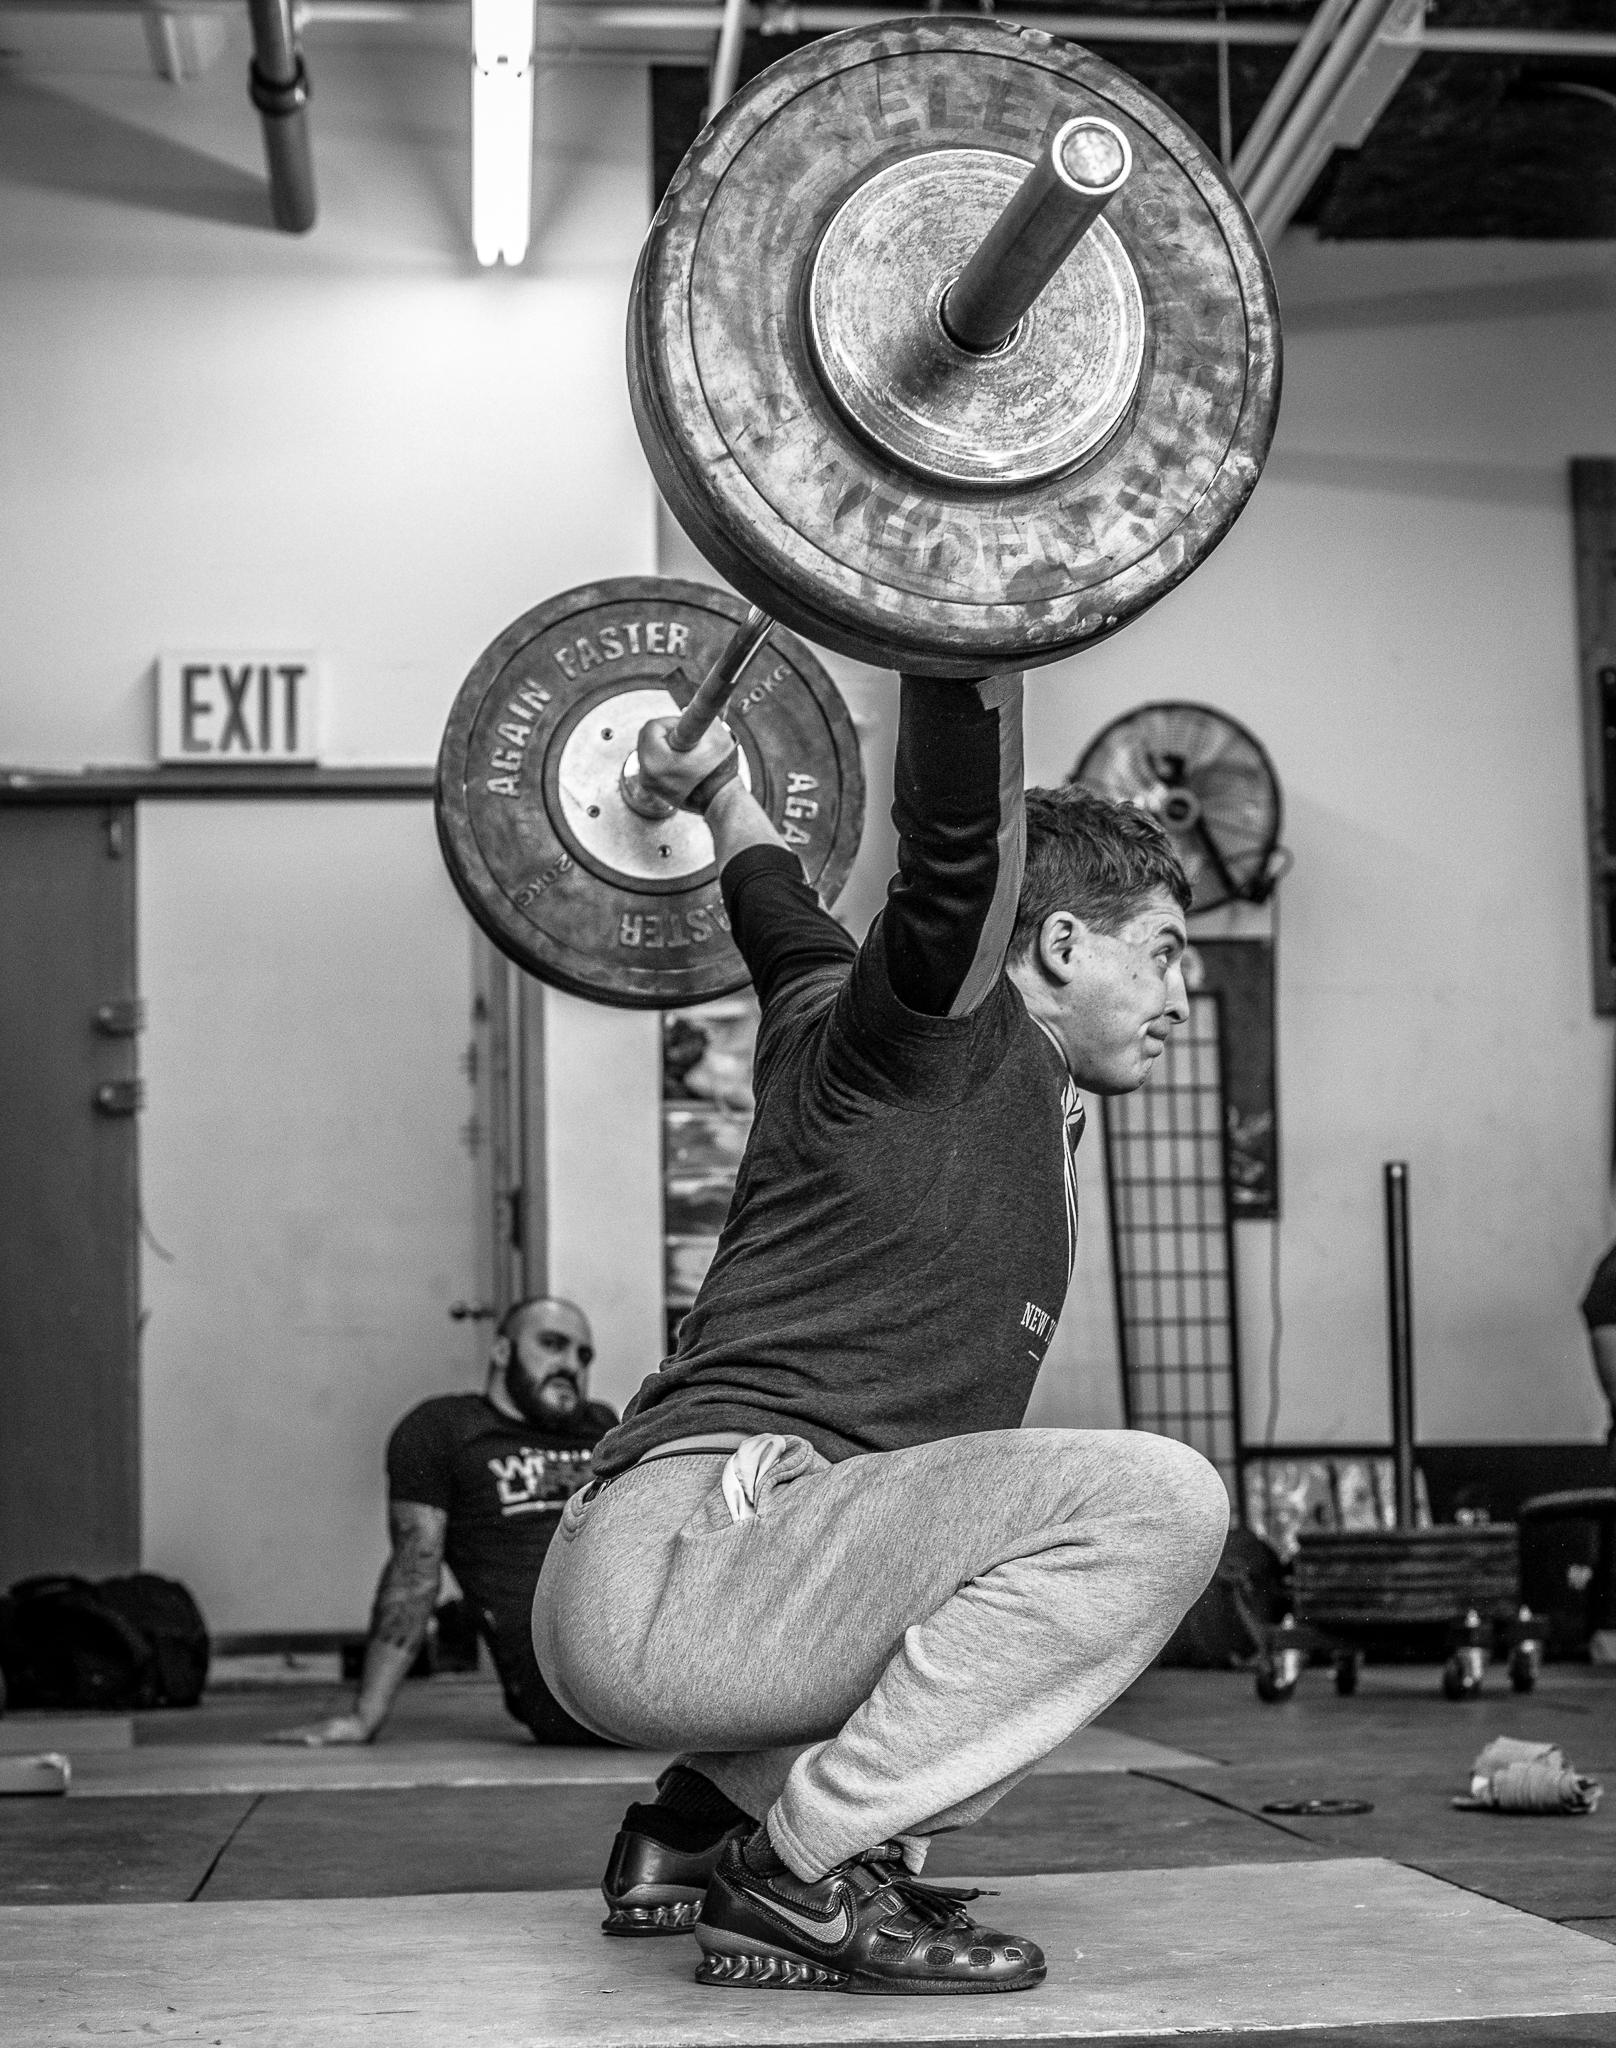 dan-casey-nywa-jdi-visit-weightlifting-coach-new-york-weightlifting-academy-10 2.jpg